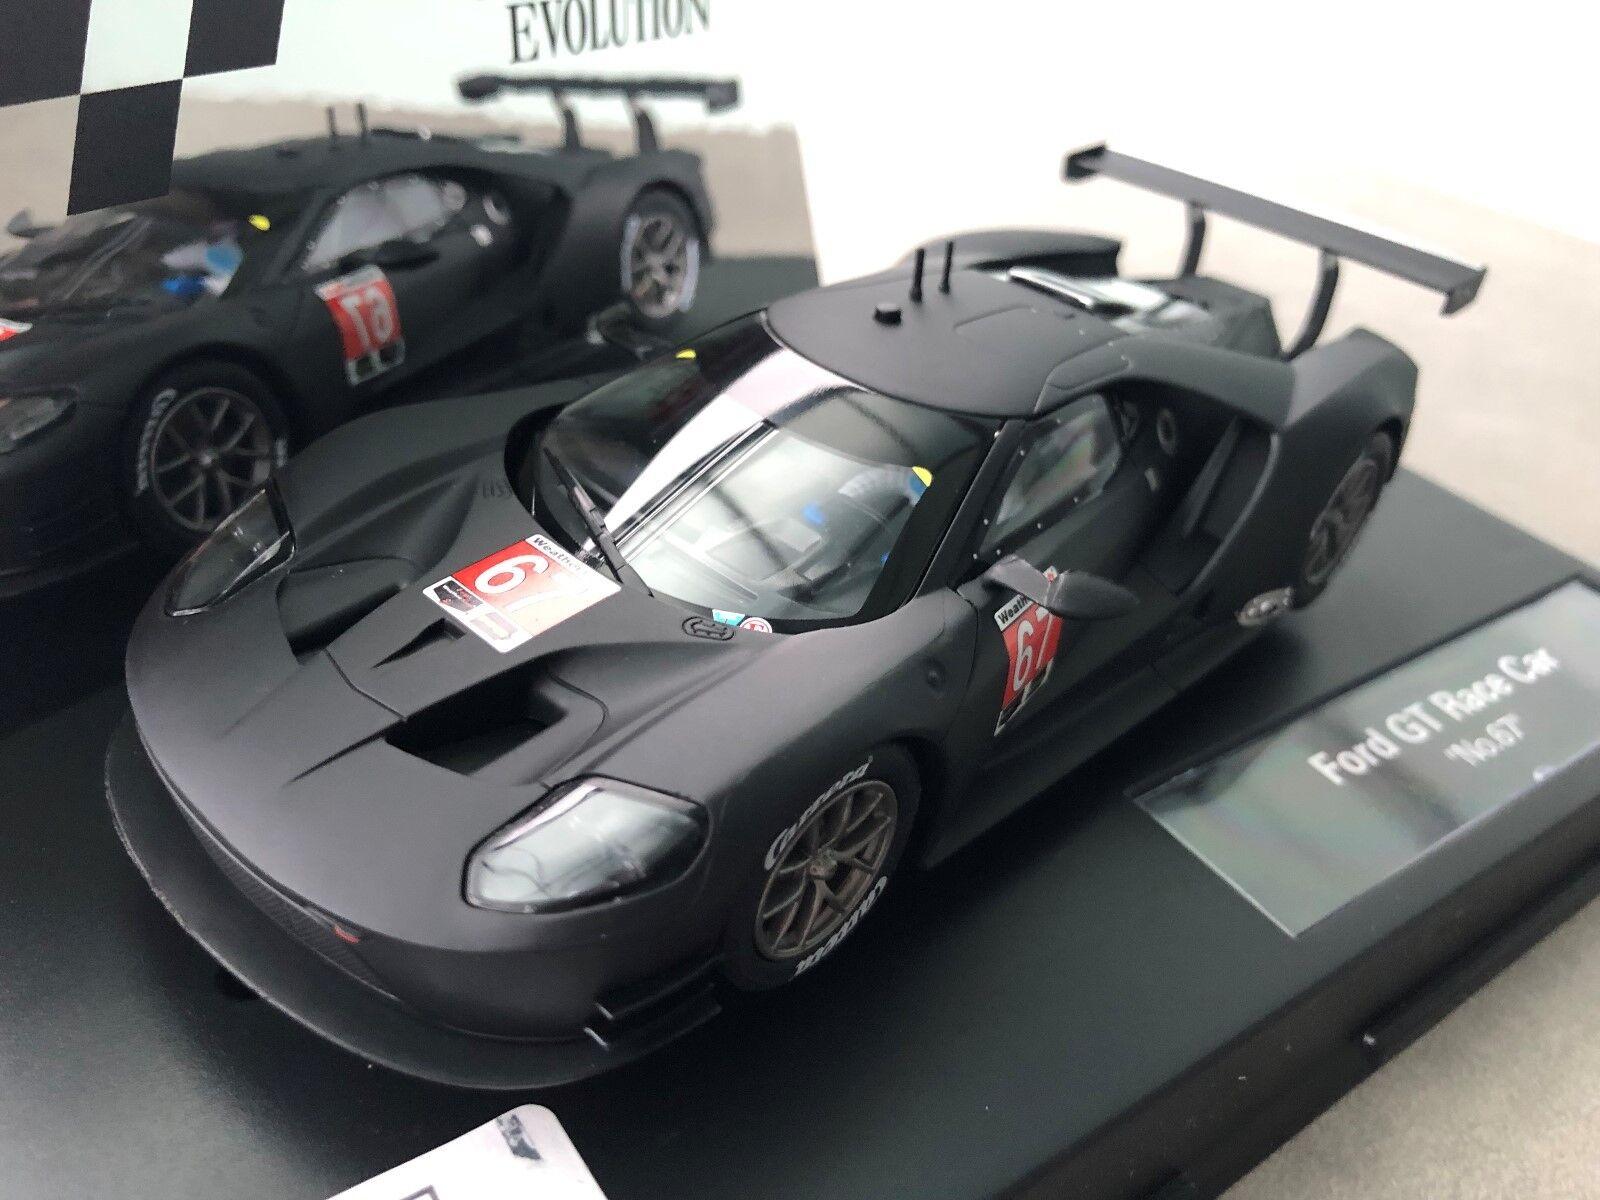 Carrera Evolution 20027584 27584 Ford Gt Race Car   No. 67   Nip